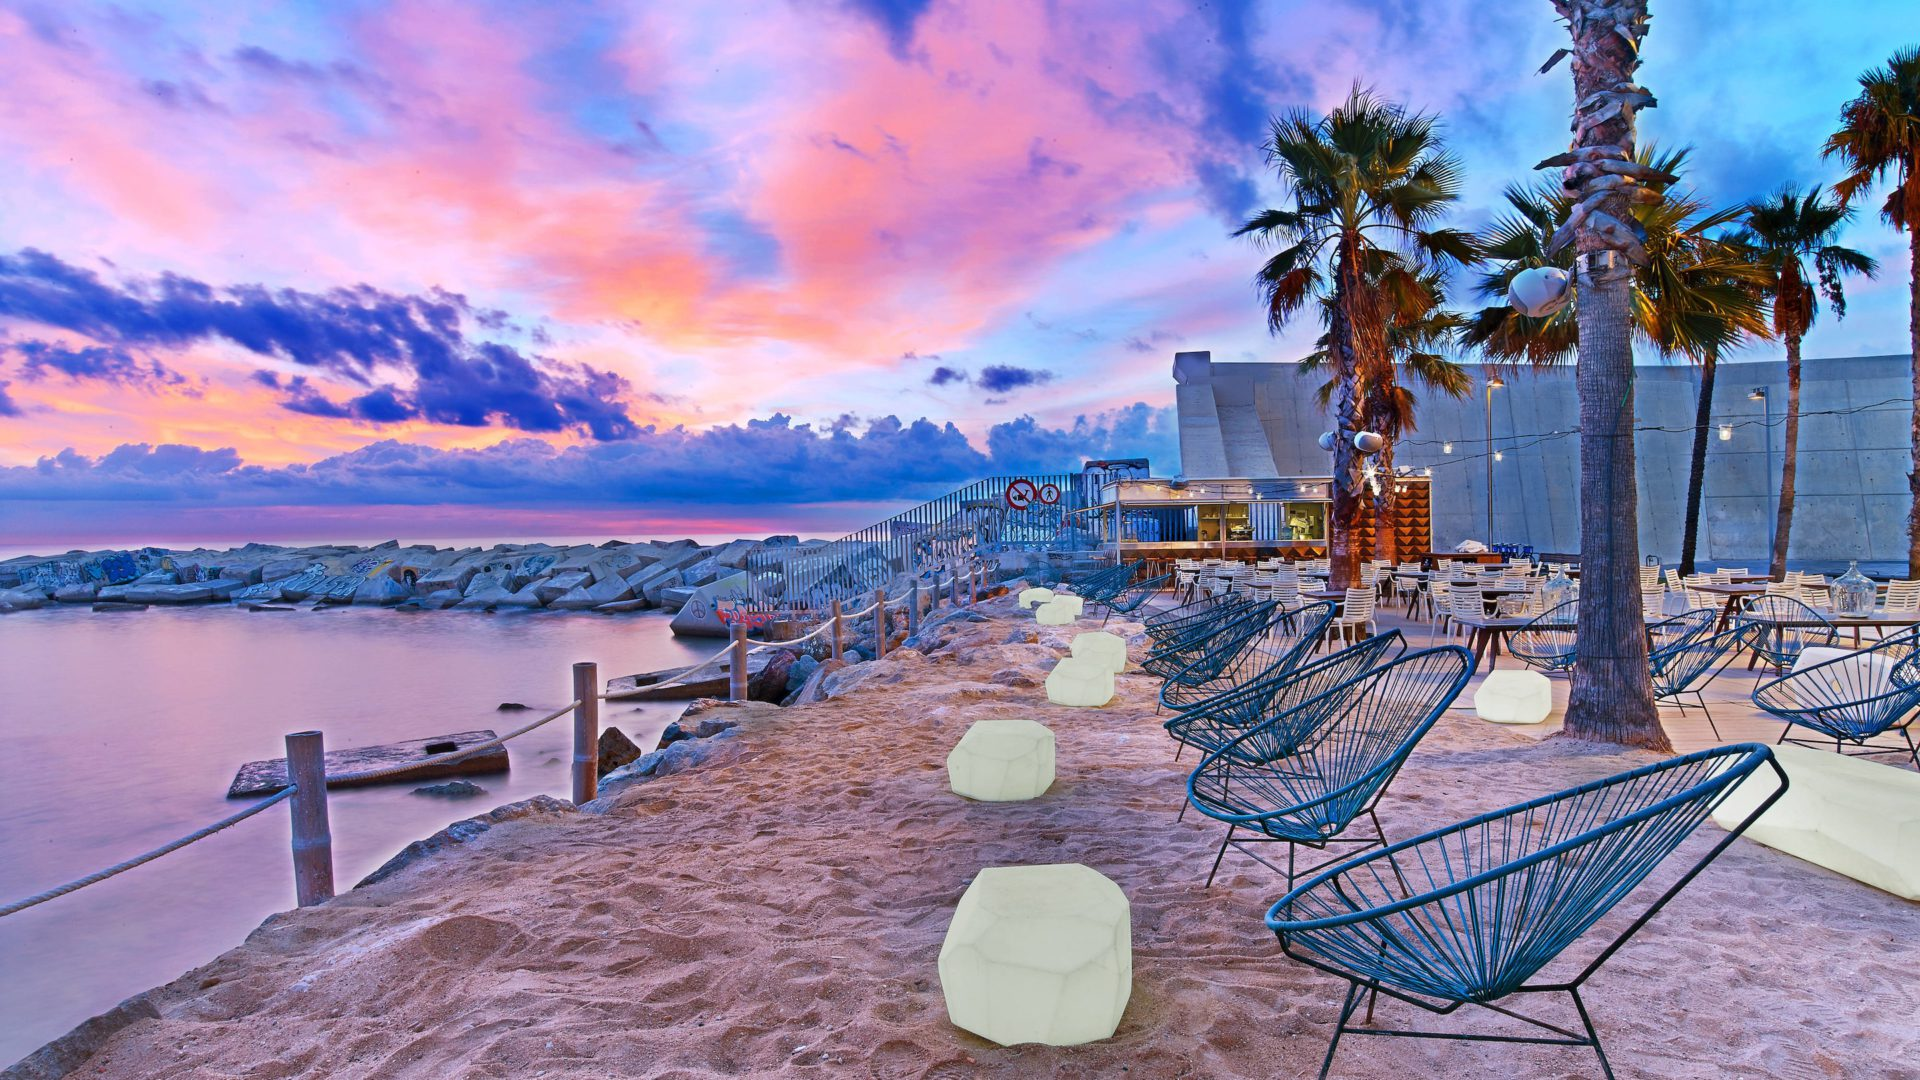 W hotel Barcelona salt beach club